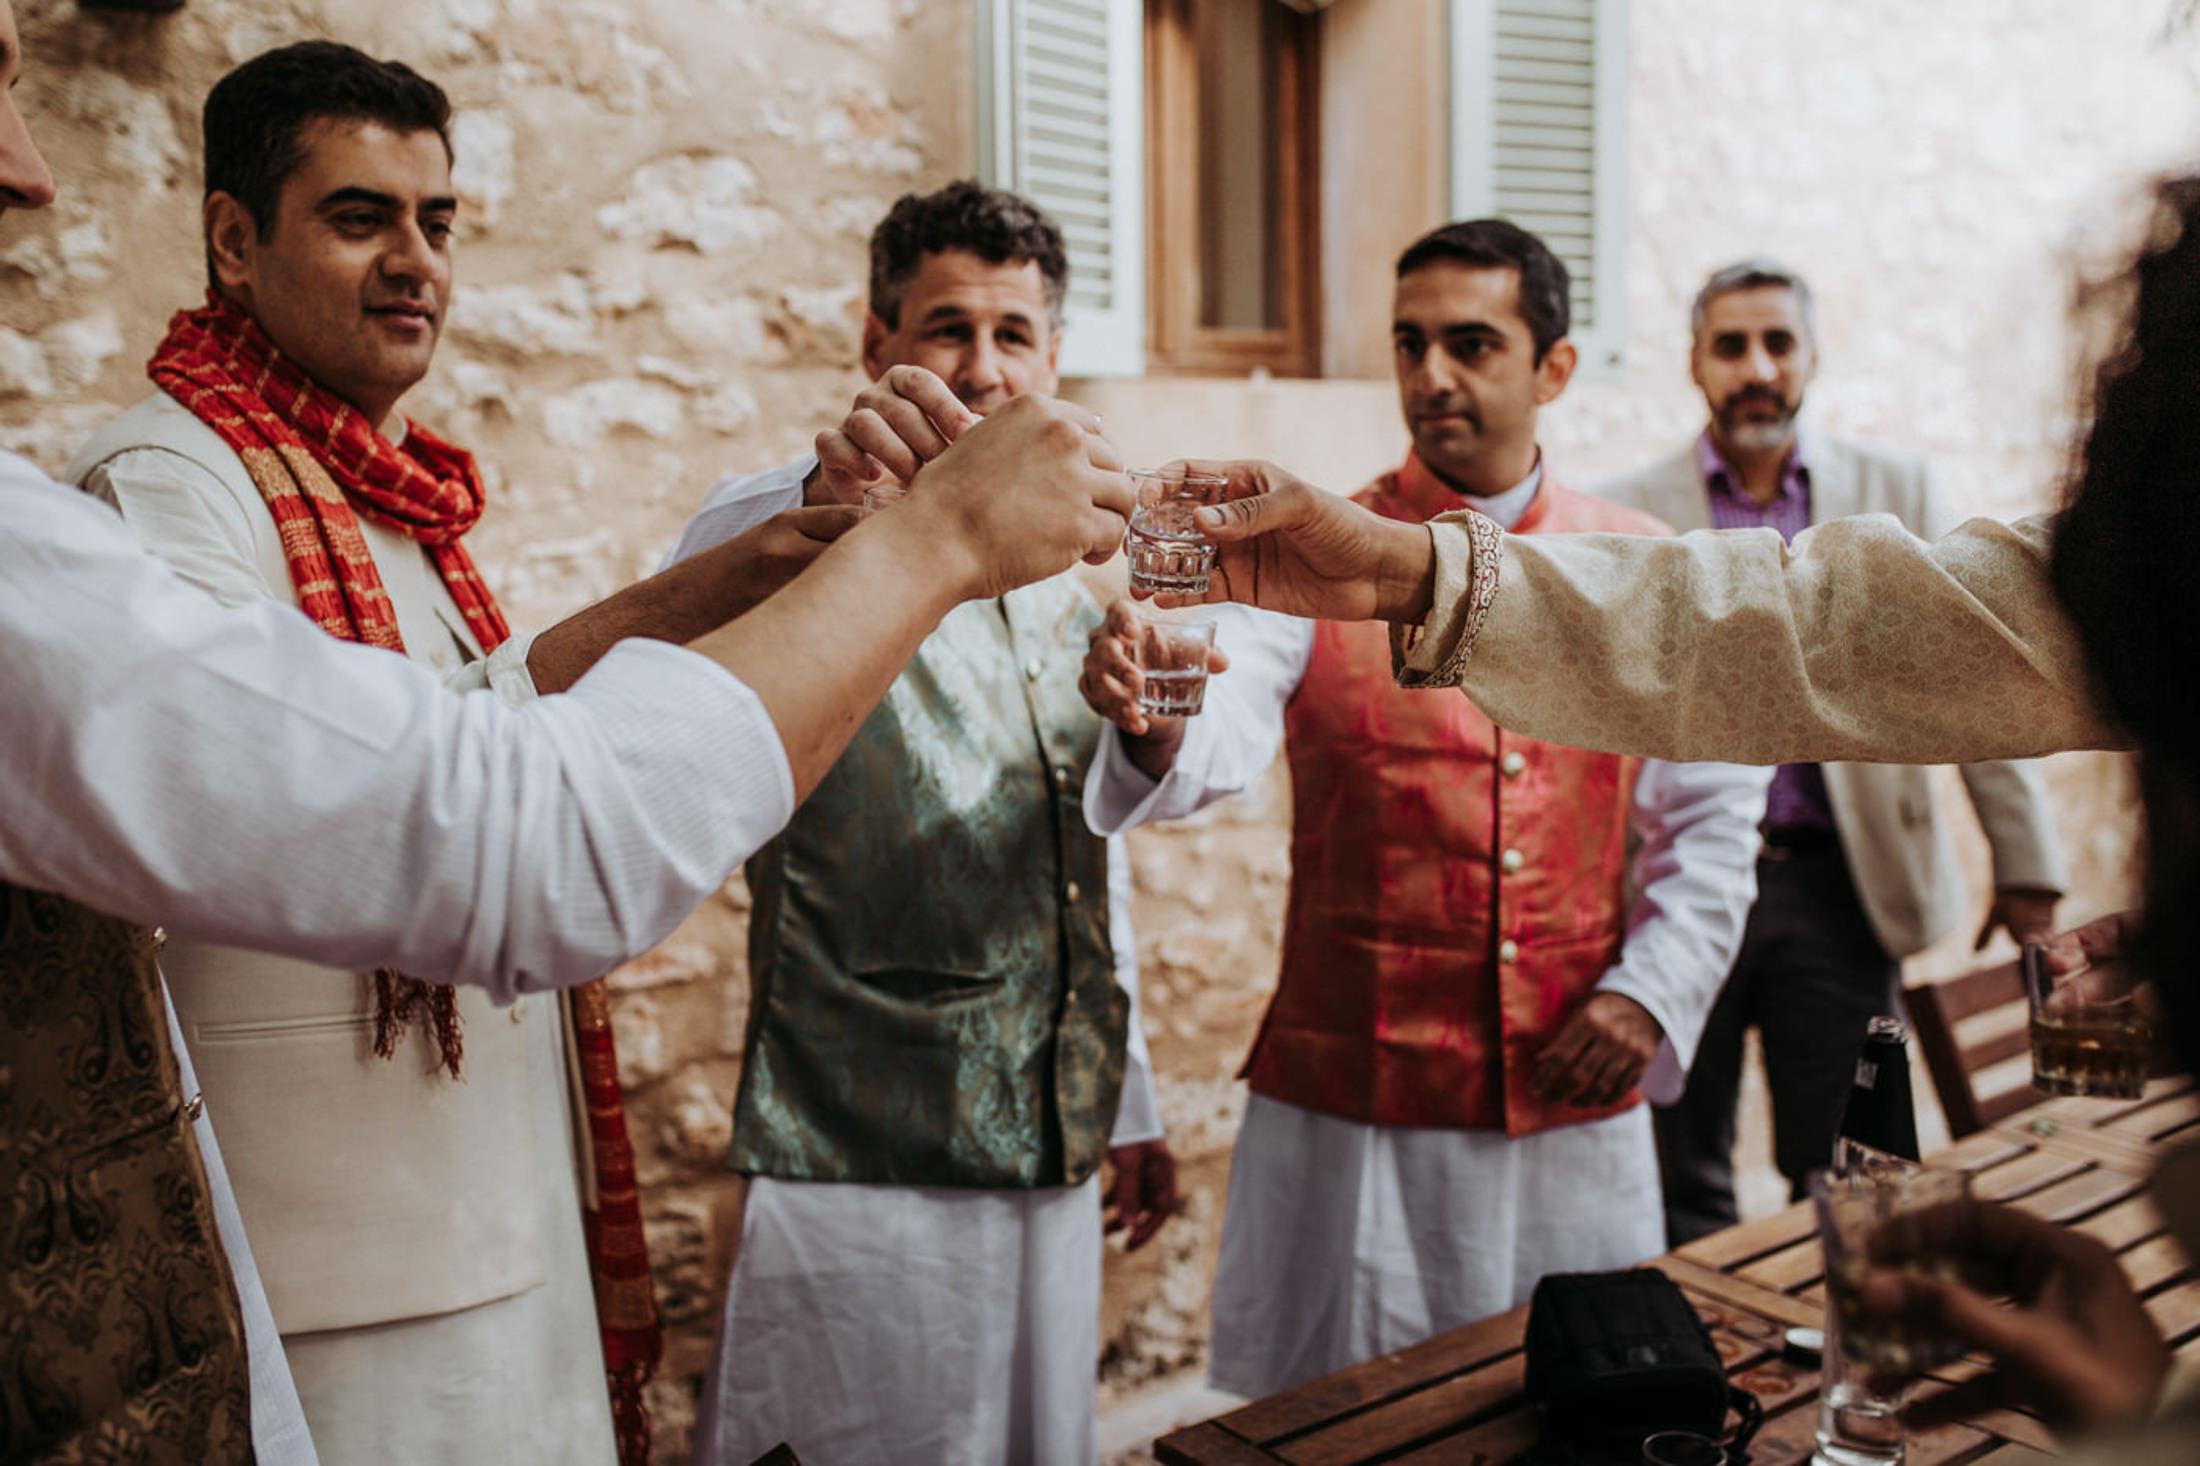 Wedding_Photographer_Mallorca_Daniela-Marquardt_Photography_New_York_Iceland_Tuscany_Santorini_Portugal_Austria_Bavaria_Elopement_Hochzeitsfotograf_AntjeRajat2_21